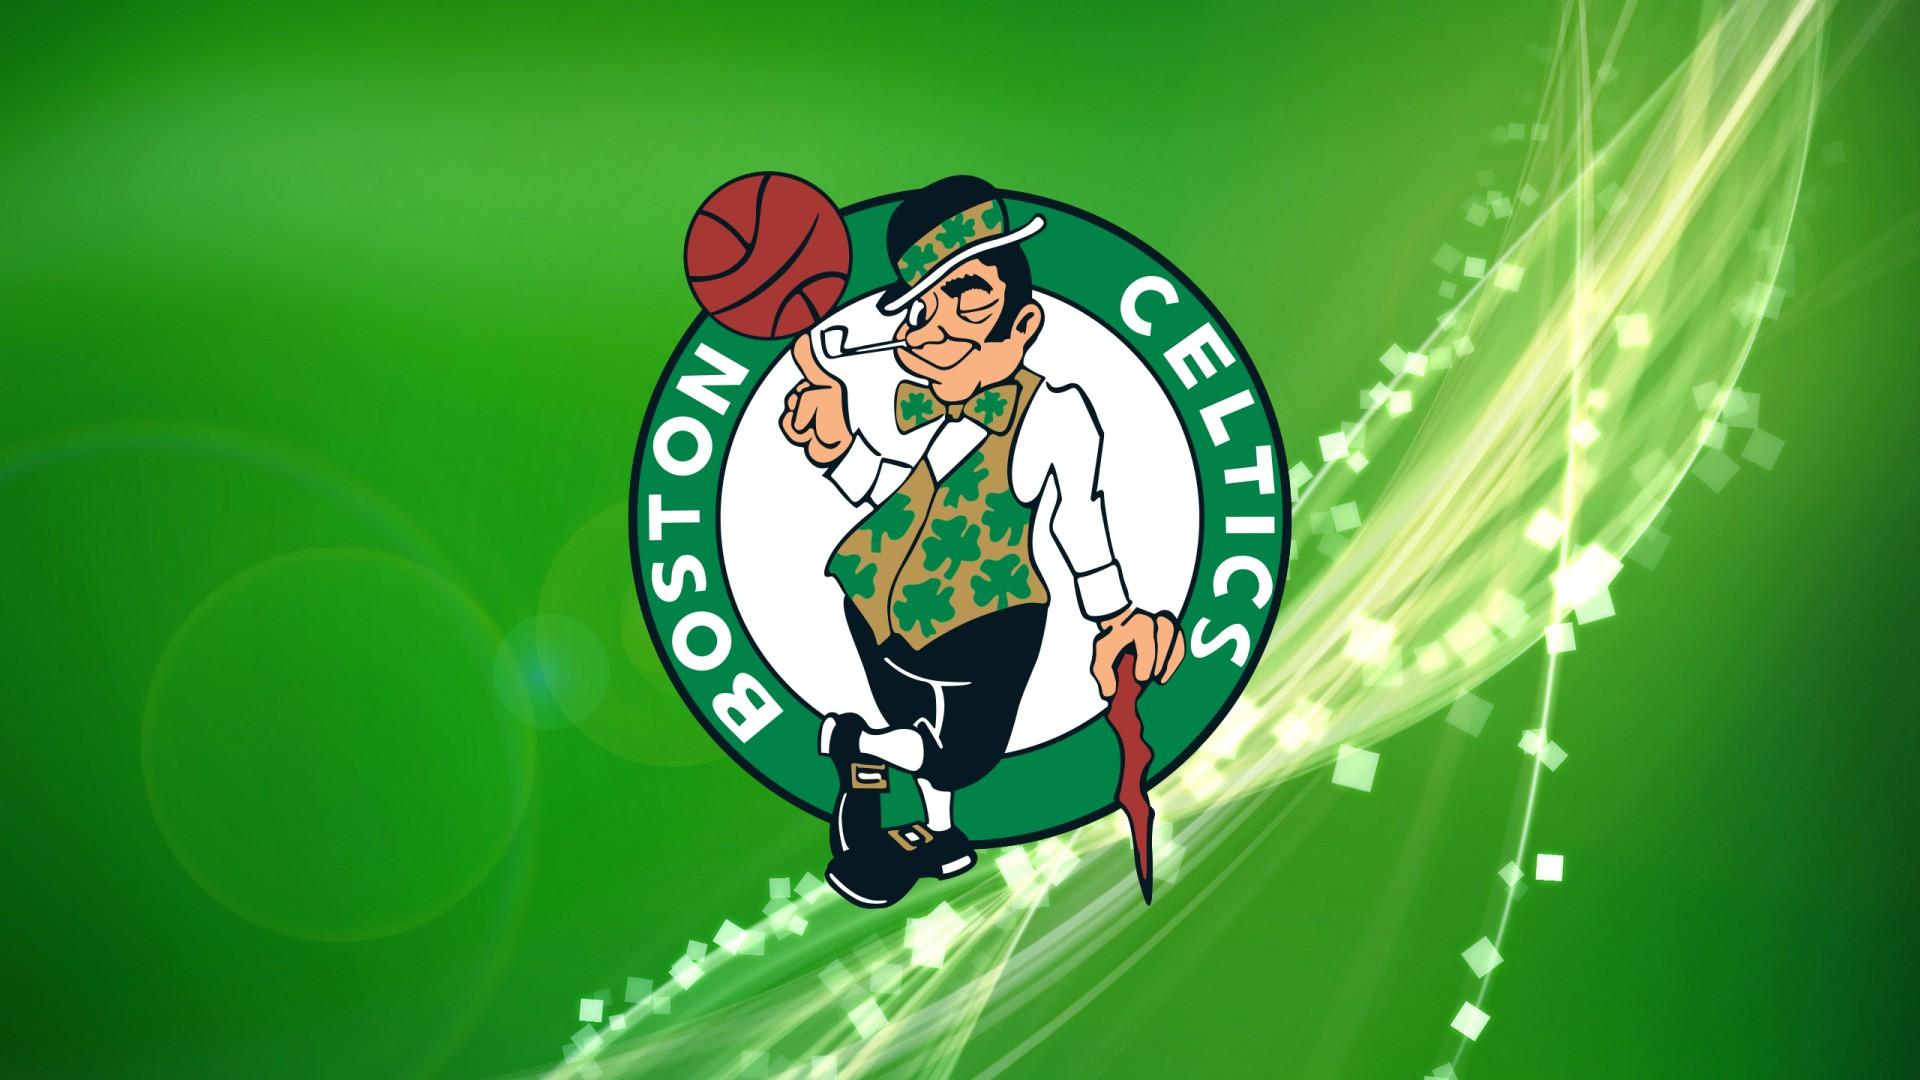 Boston Celtics Logo Desktop Wallpaper 2019 Basketball Wallpaper 1920x1080